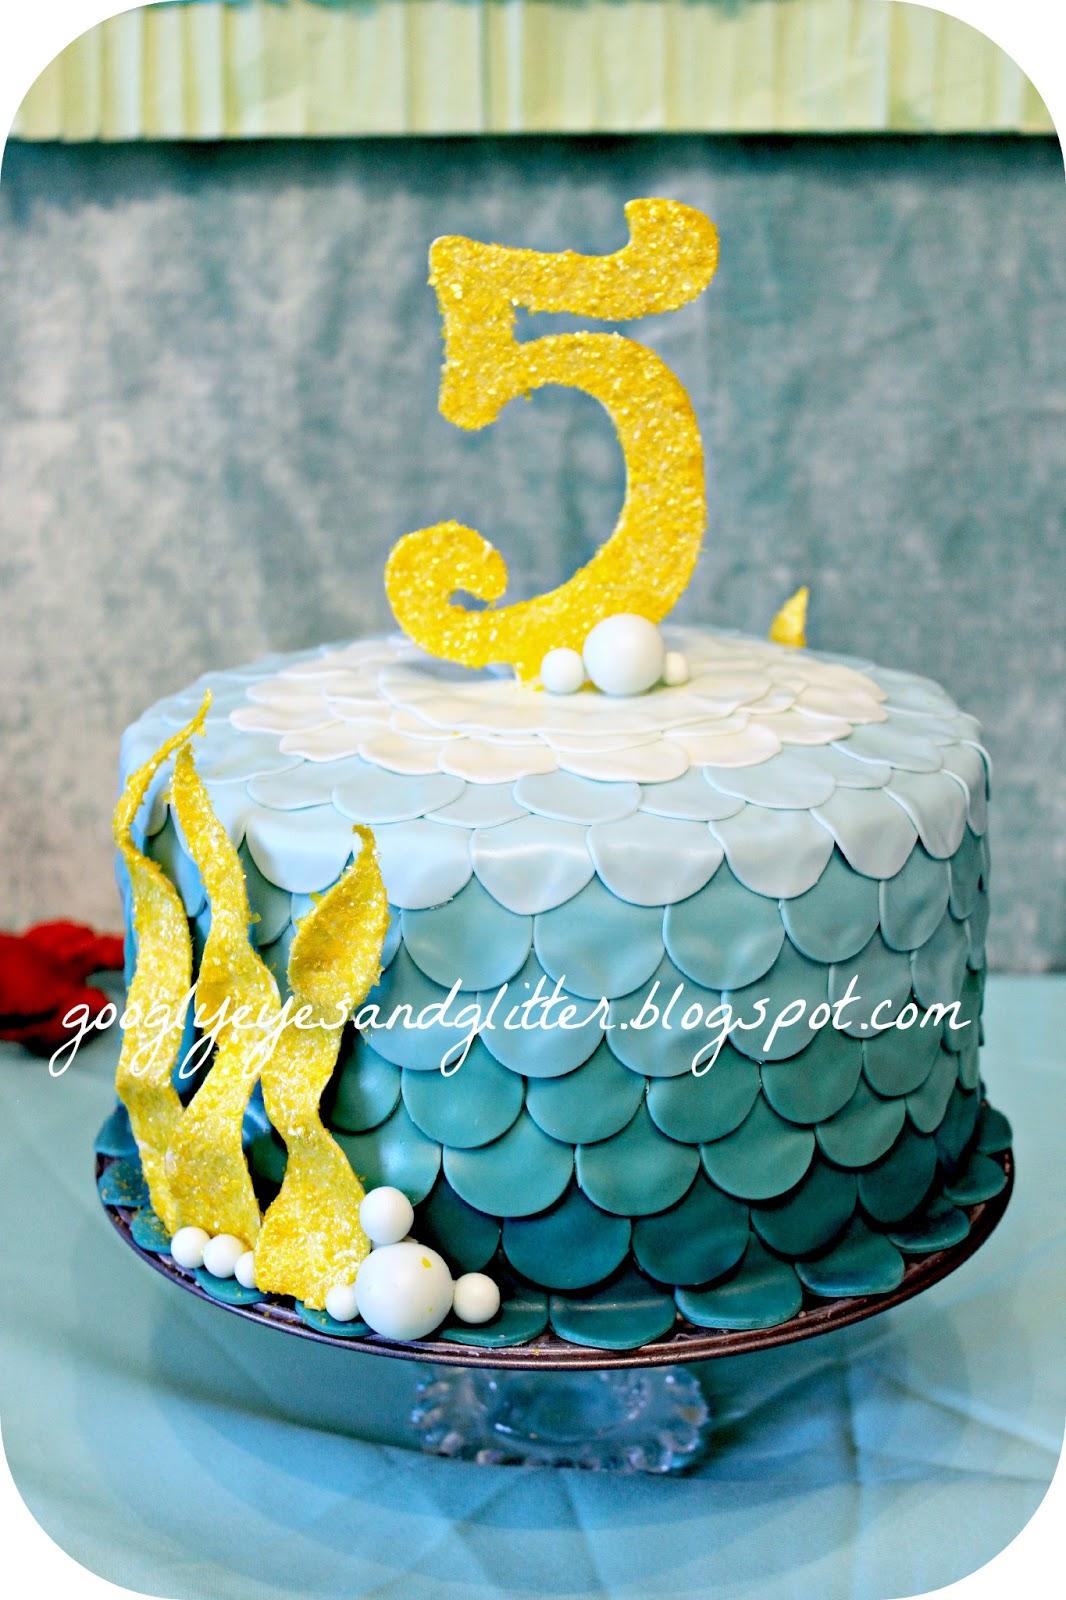 Googly Eyes & Glitter: Under The Sea Mermaid Themed Birthday Party